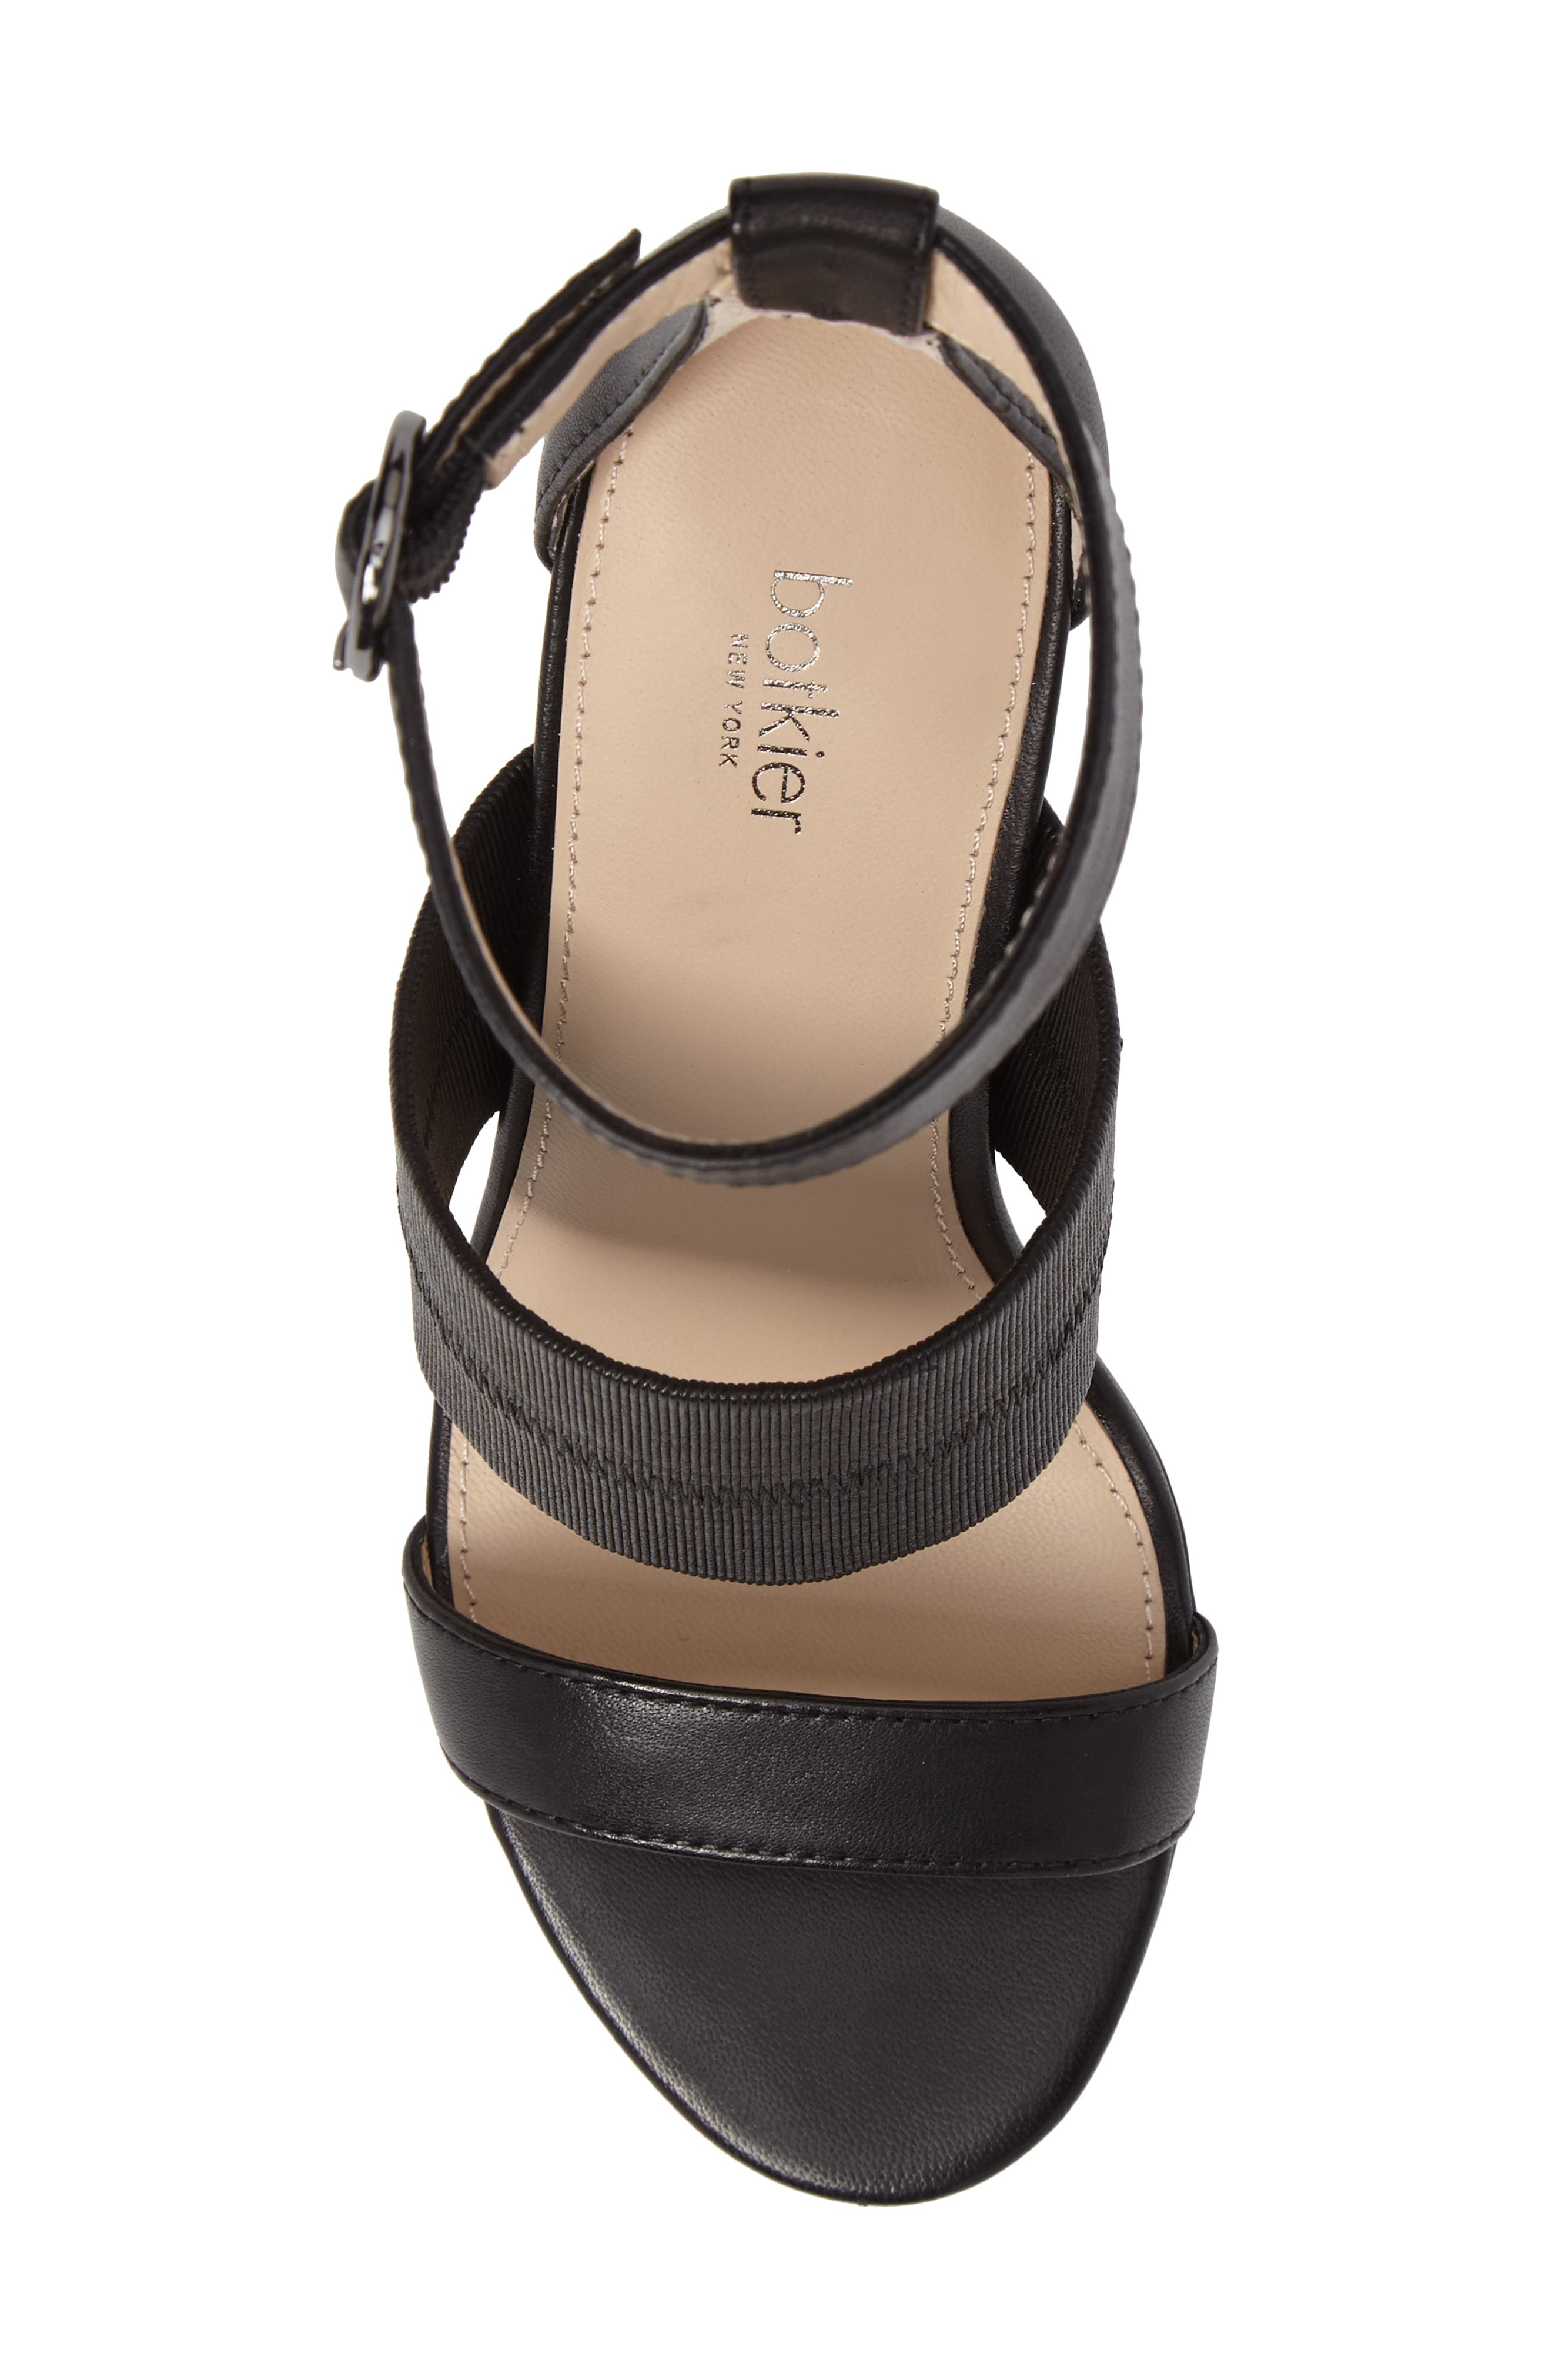 Gisella Ankle Strap Sandal,                             Alternate thumbnail 5, color,                             Black Leather